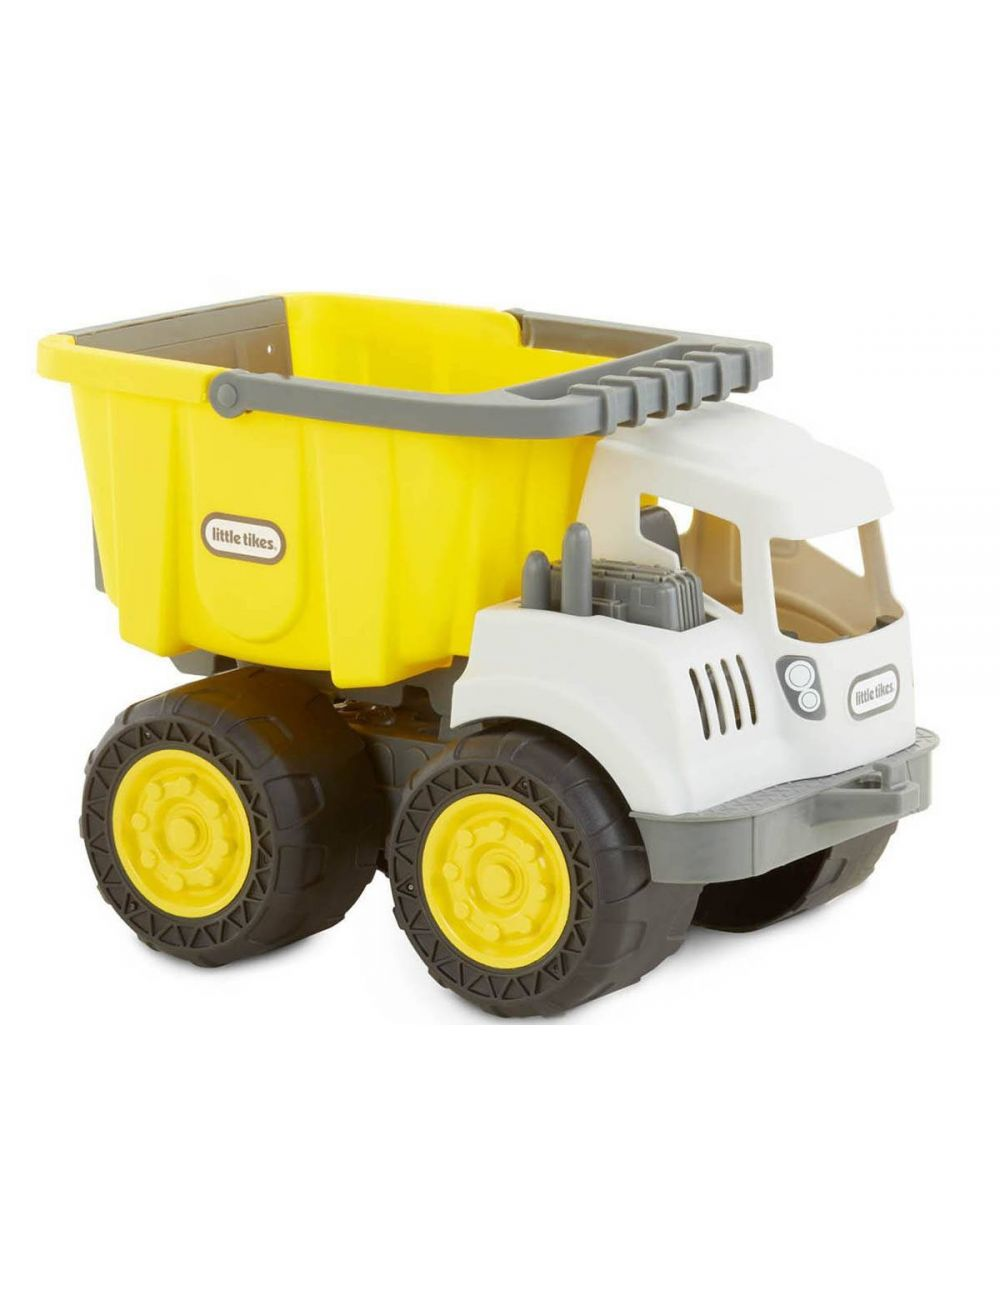 Little Tikes Dirt Diggers Wywrotka 2w1 650543